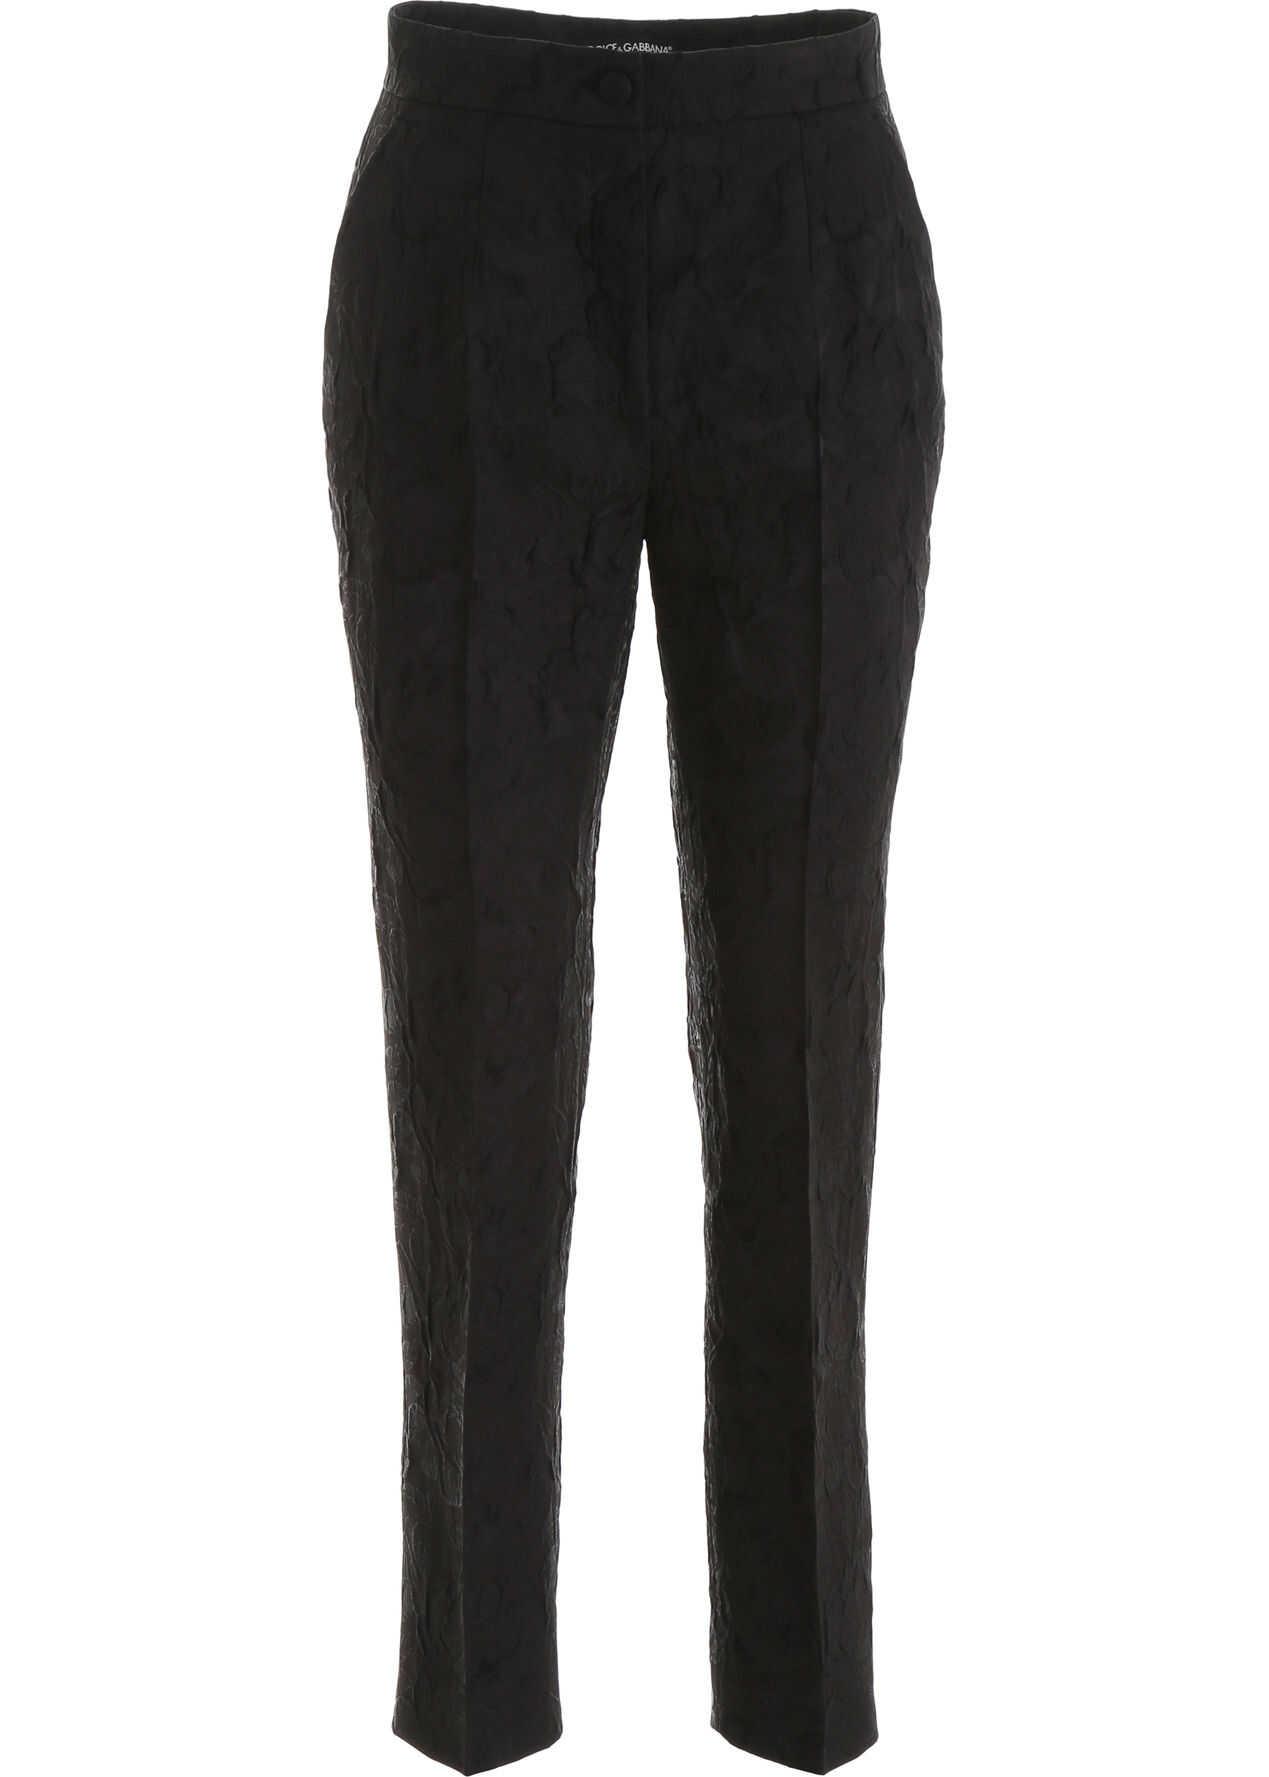 Dolce & Gabbana Floral Jacquard Trousers NERO